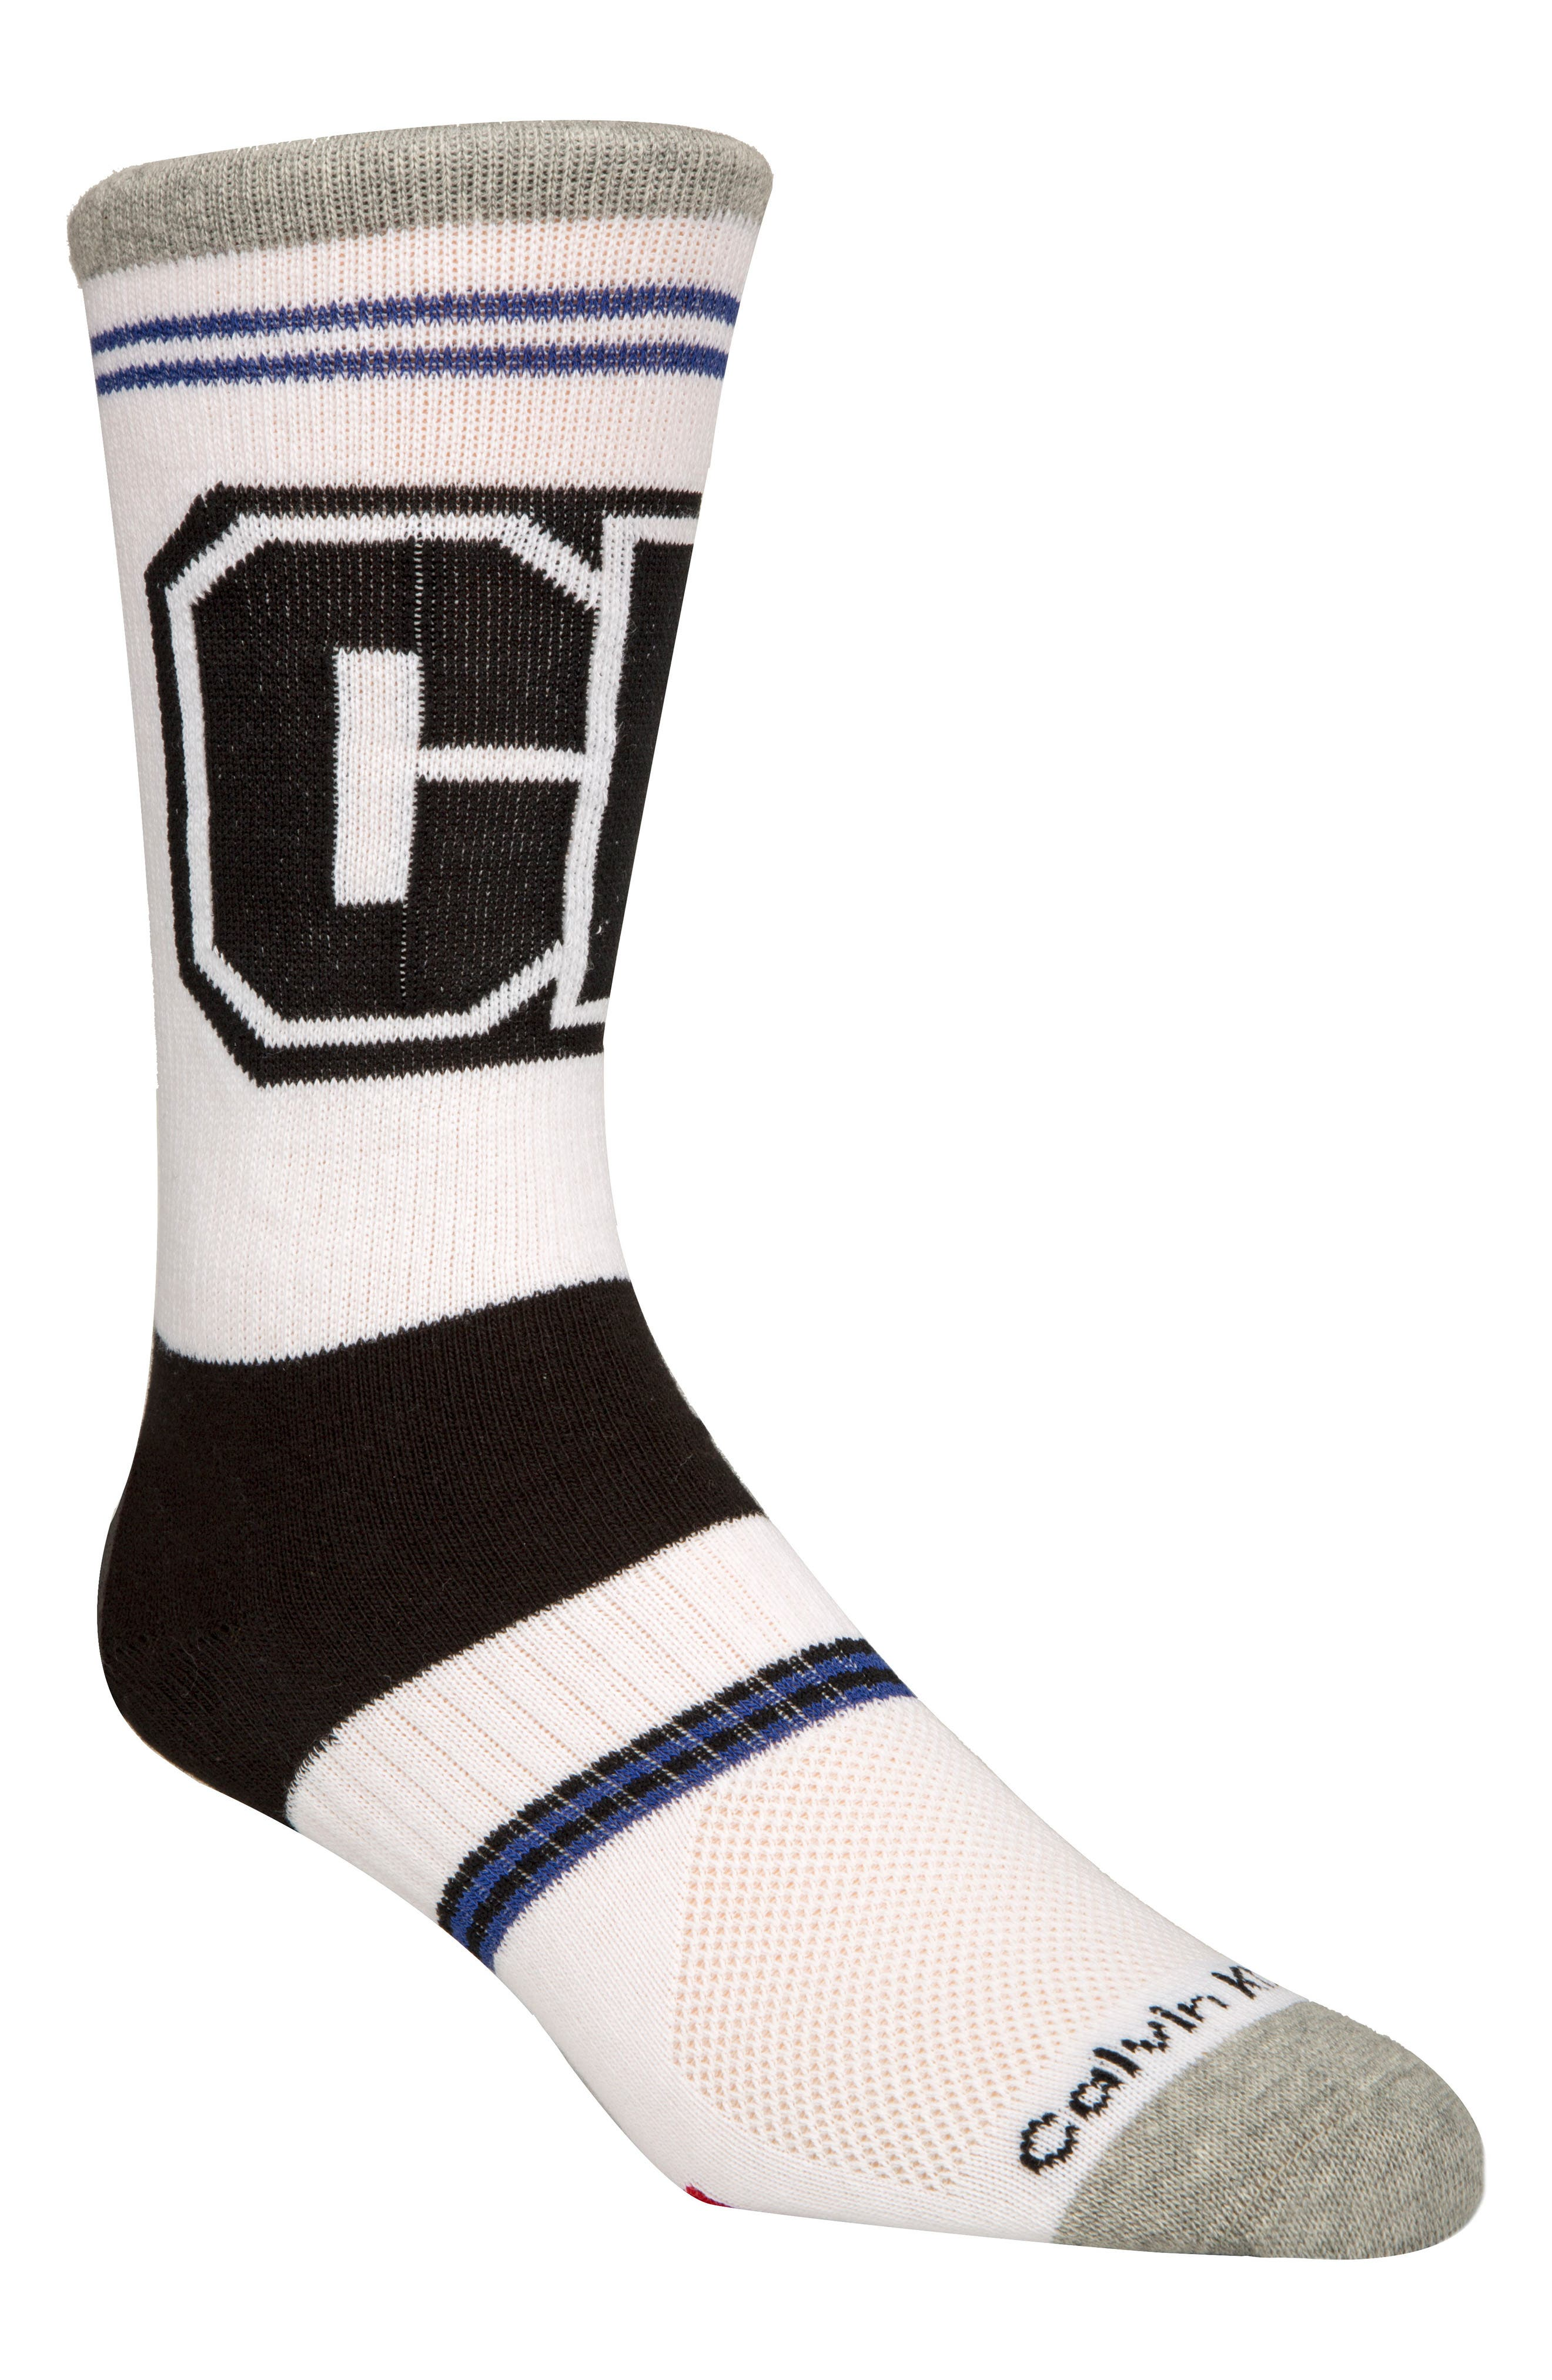 Bold Socks,                             Main thumbnail 1, color,                             White